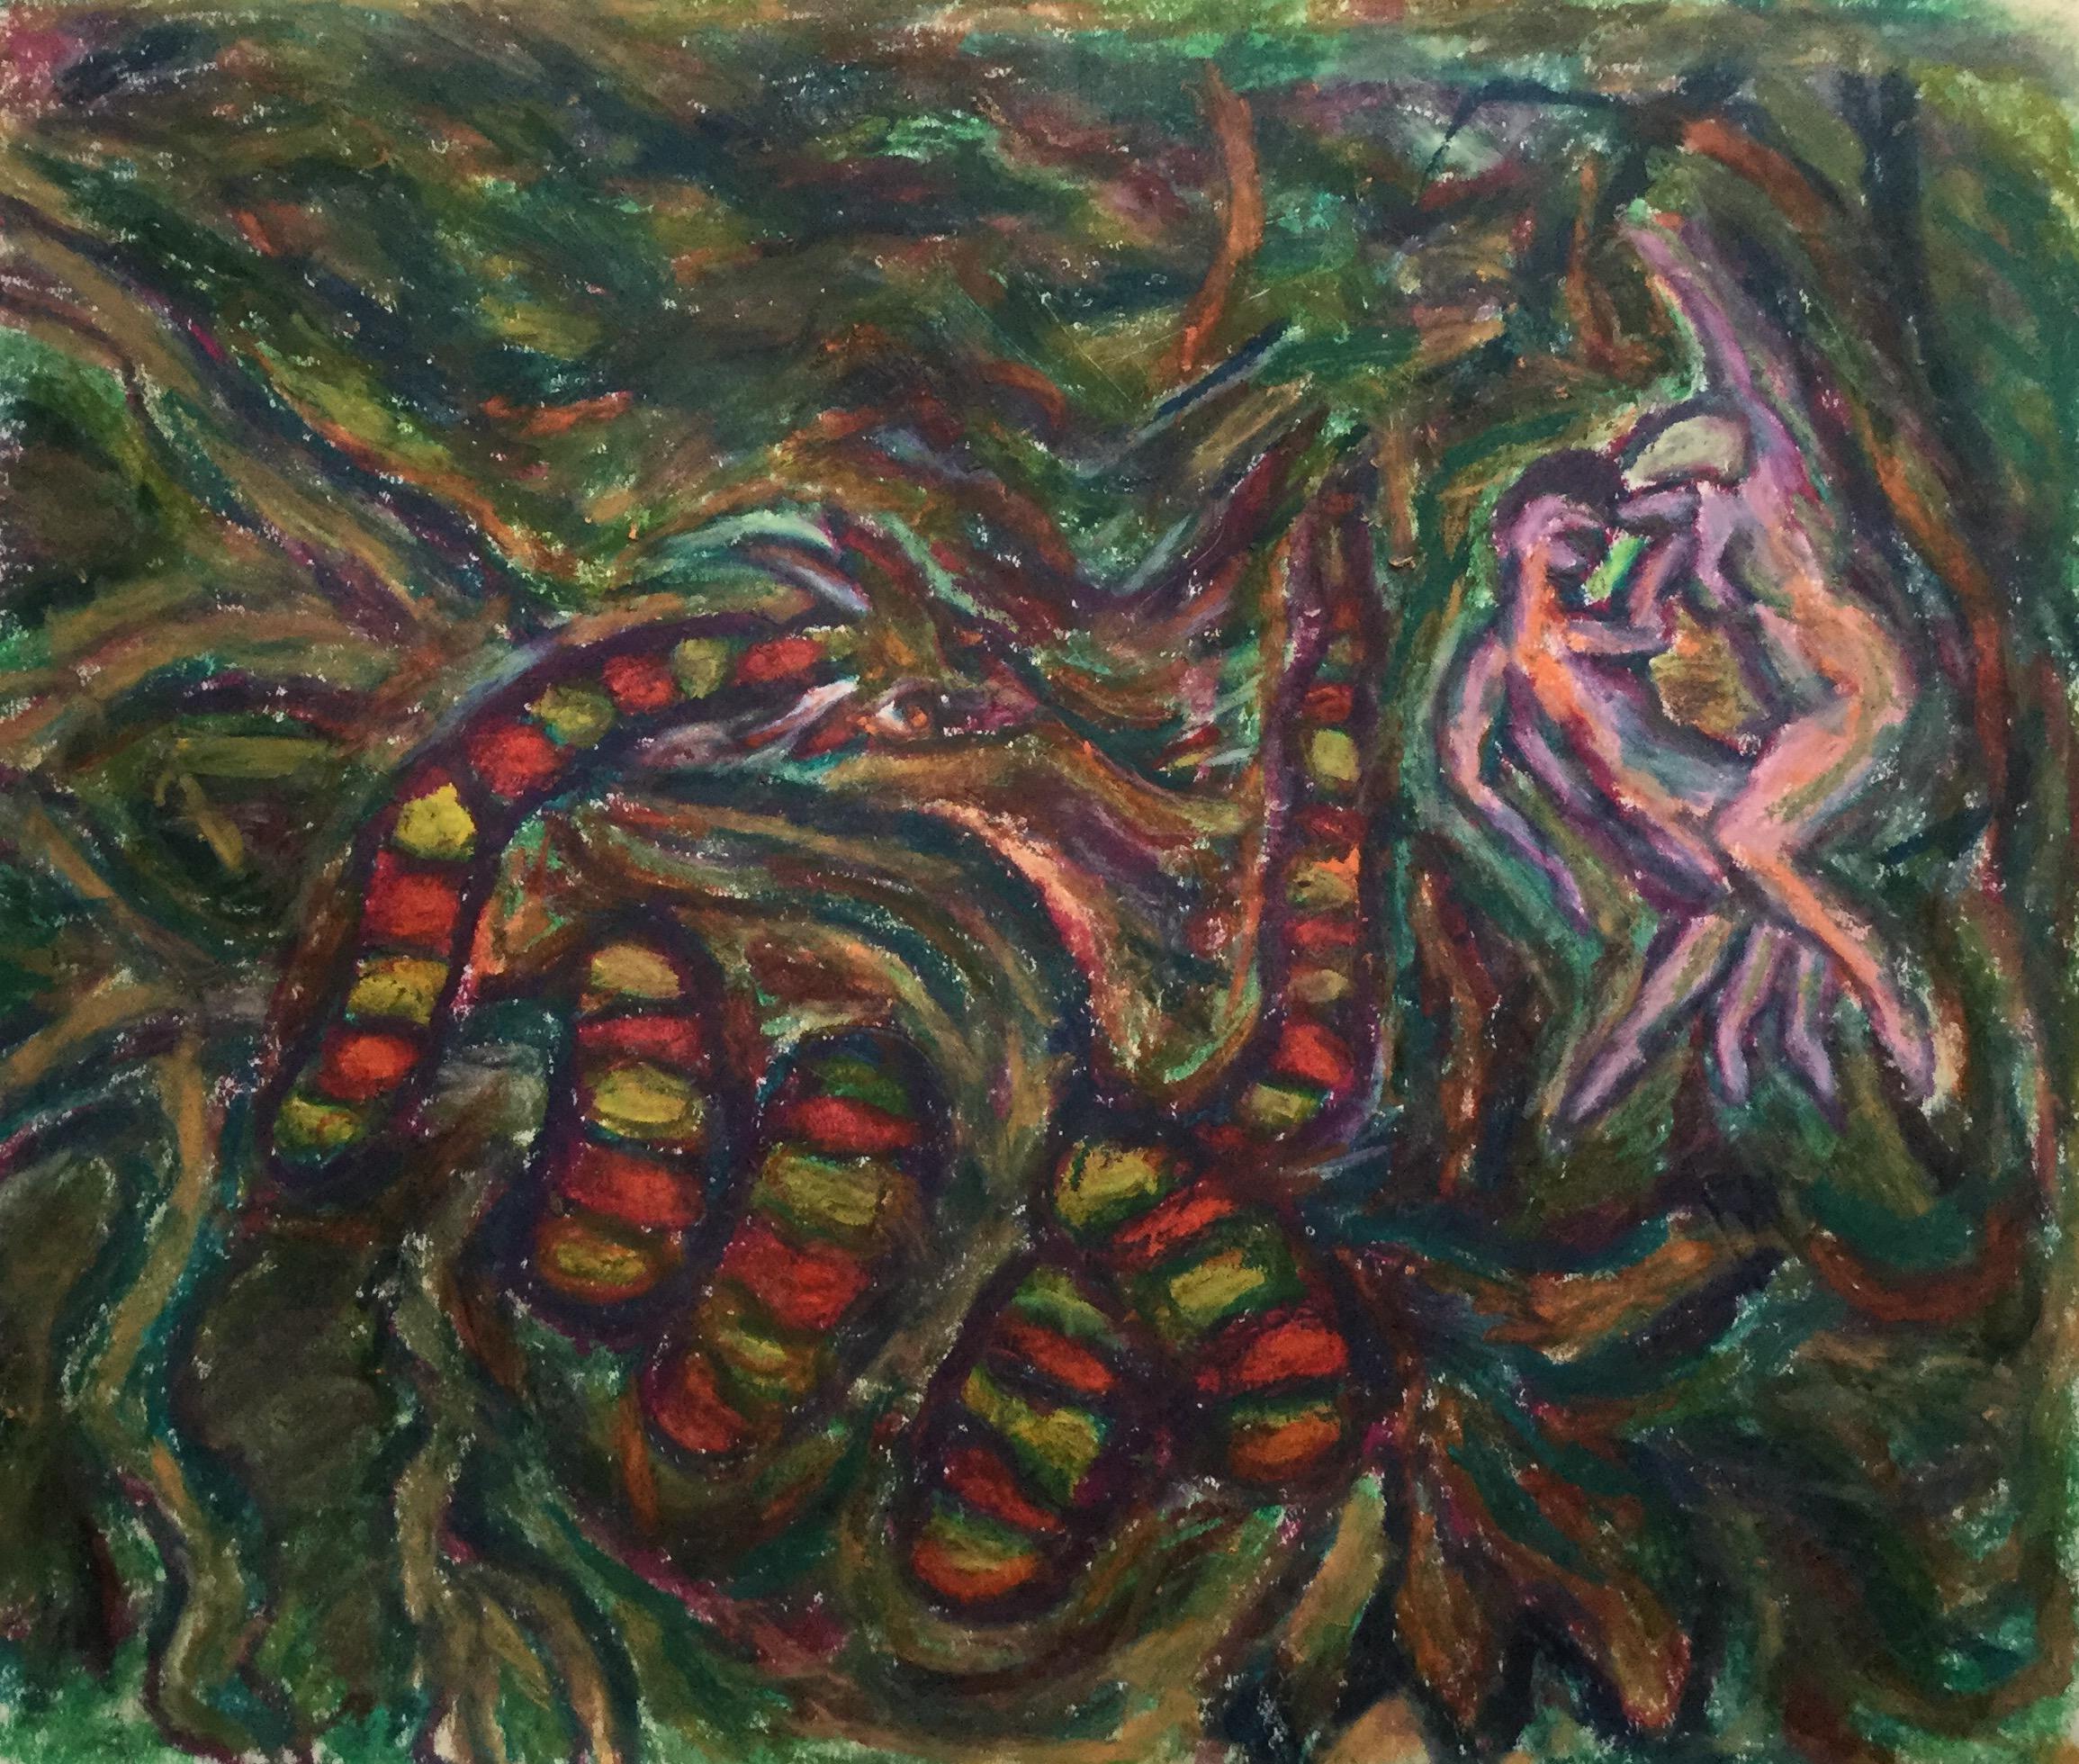 Snake, Adam, and Eve